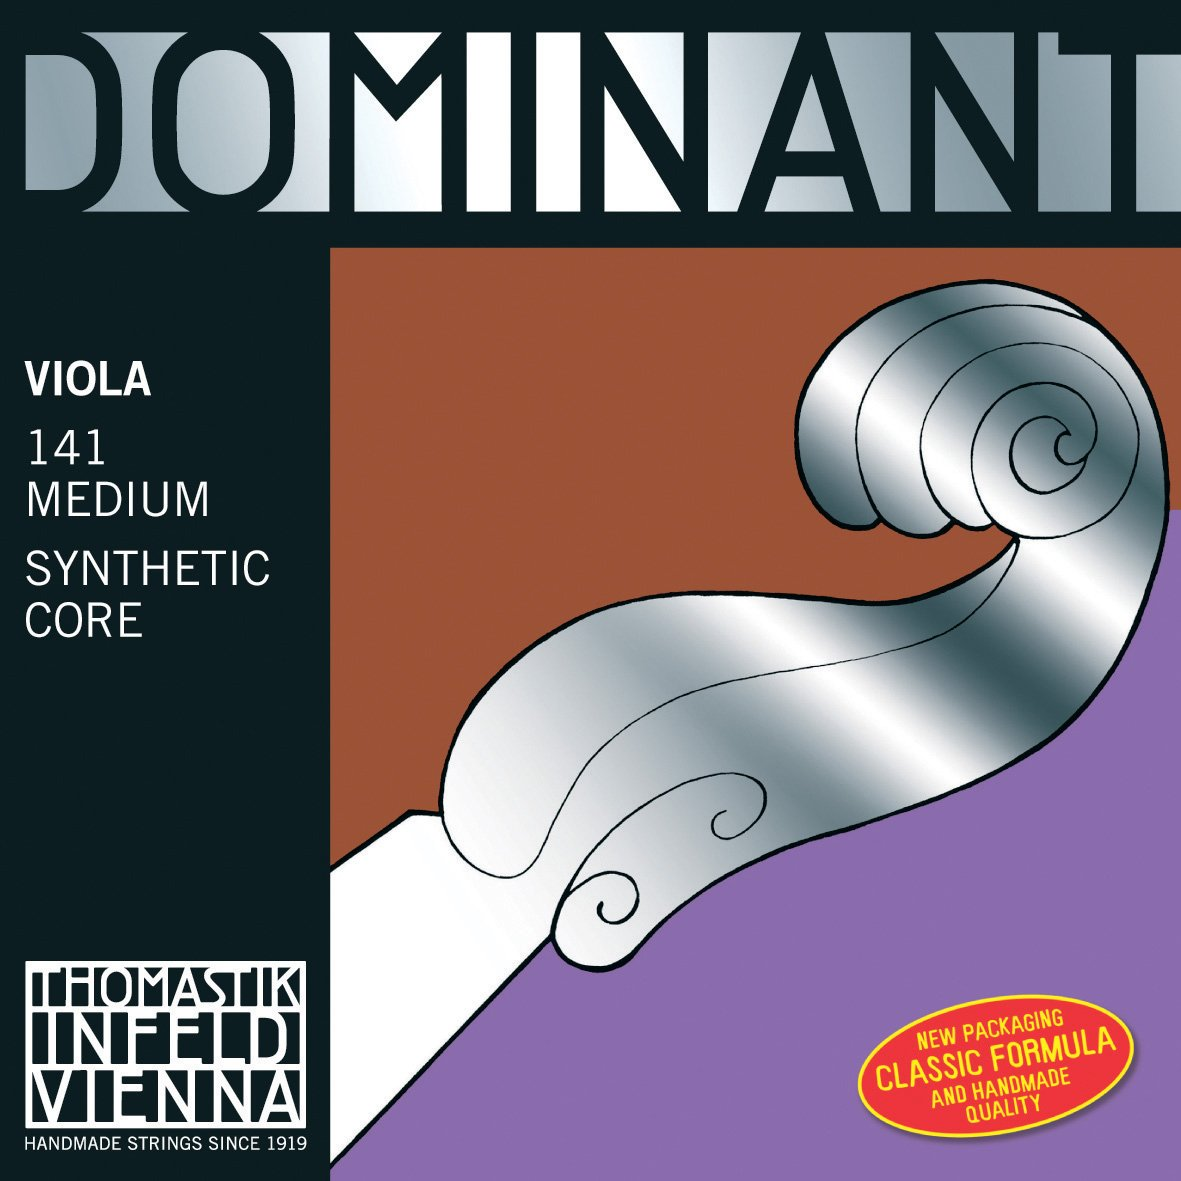 Thomastik-Infeld 138 Dominant Nylon Core Viola String, Medium Gauge, 4/4 Scale, G